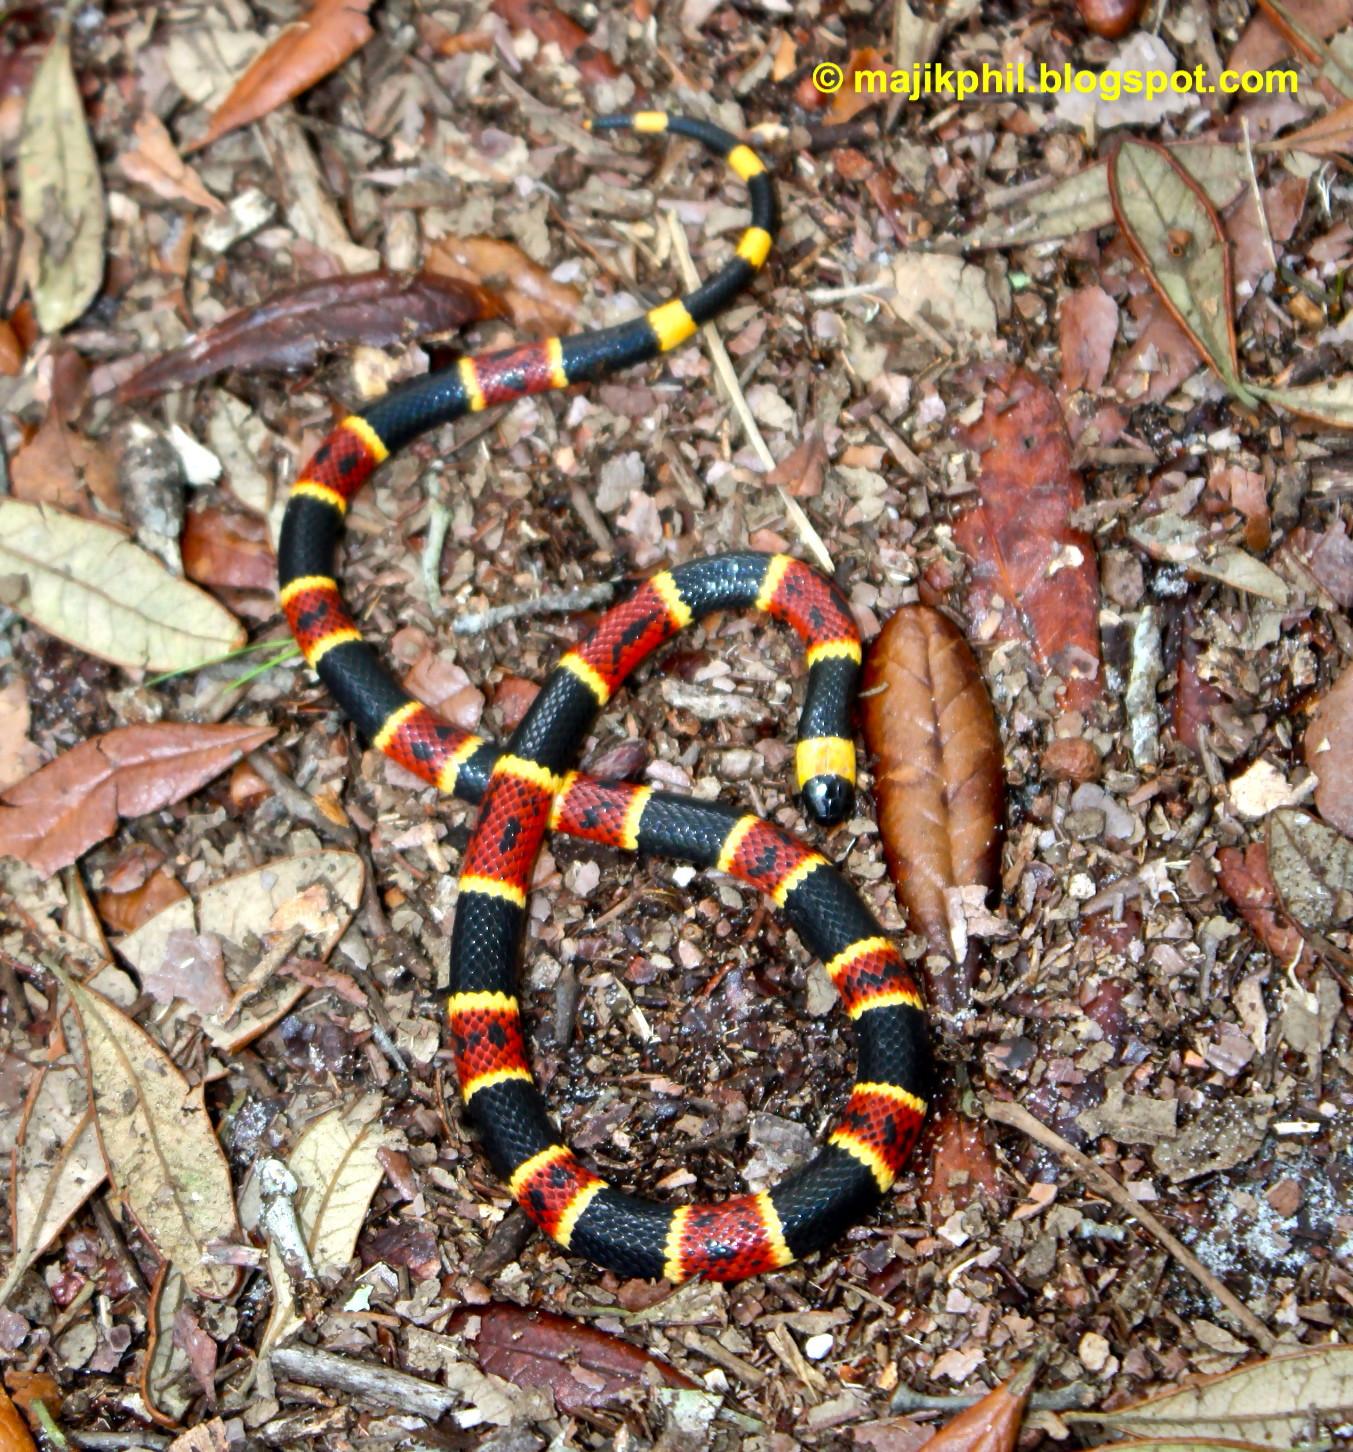 b385132e2 Coral Snake Season | Phillip's Natural World